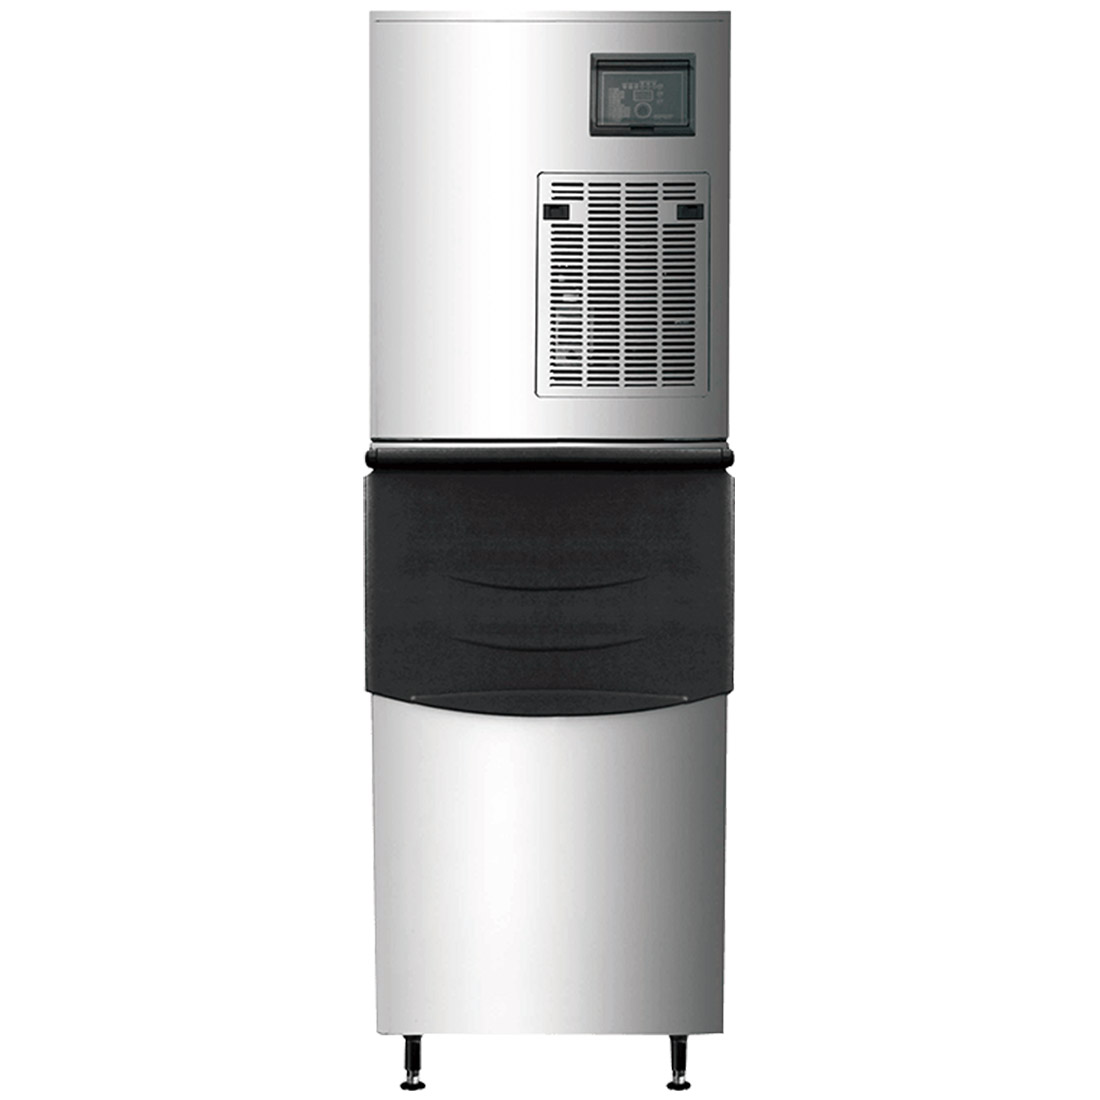 Blizzard Professional Ice Maker - SN-145C